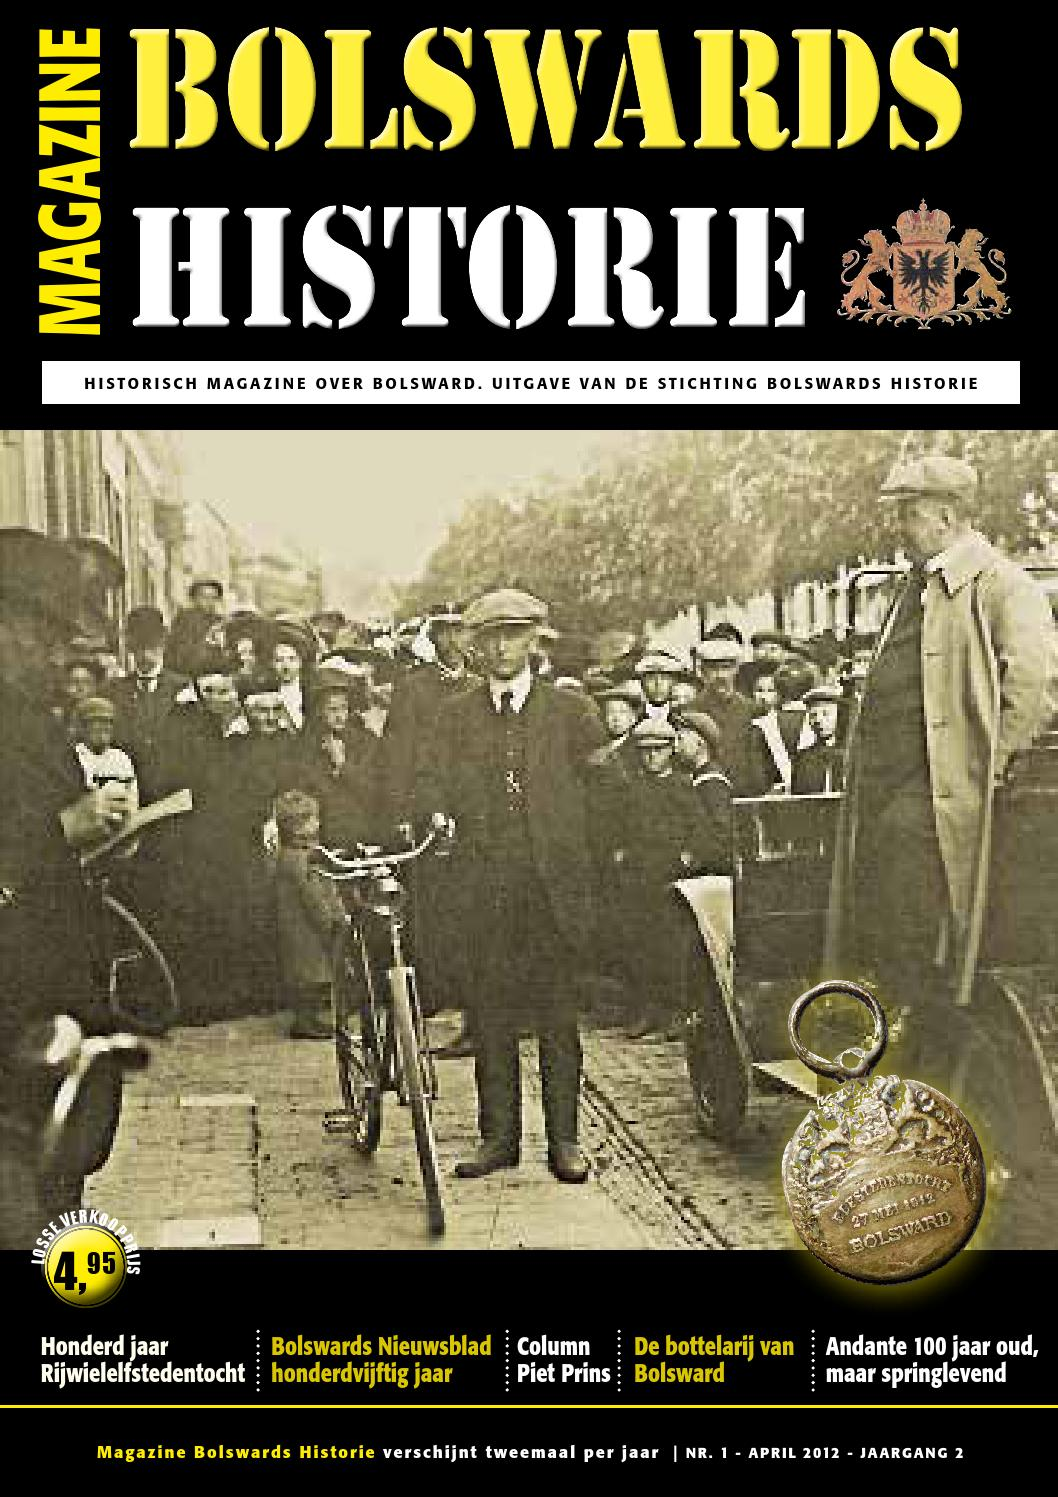 Bolswards_historie_magazine_lr_ _nu_bbc4e0acc9f709 on Food Services